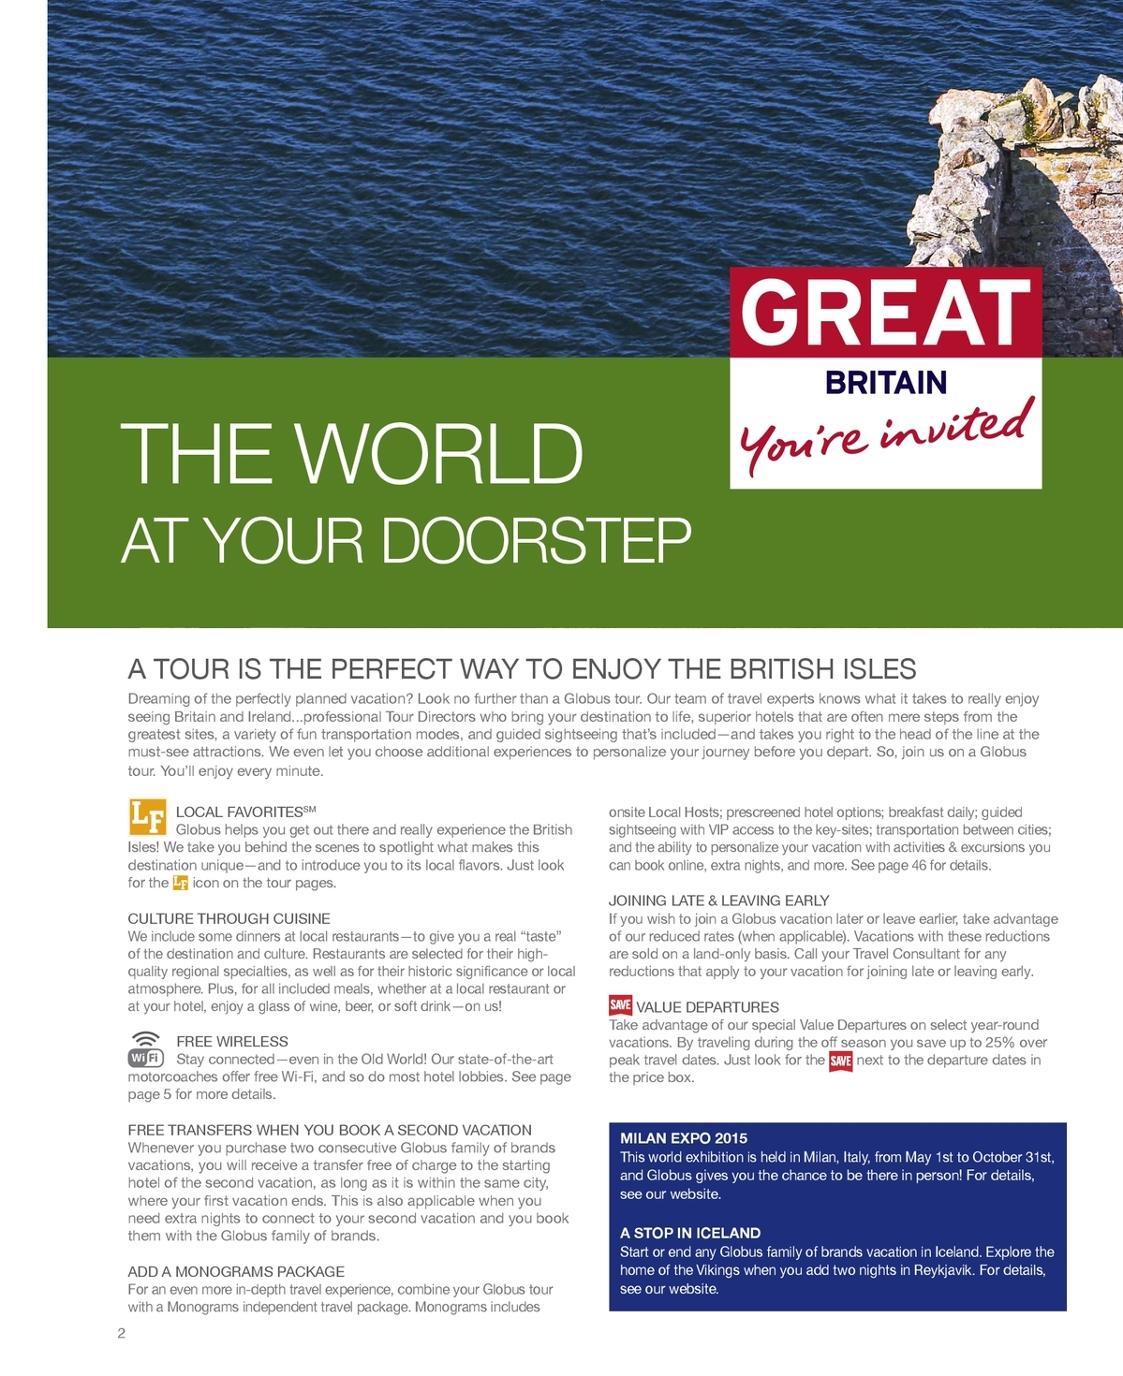 2015 Globus Britain & Ireland Brochure